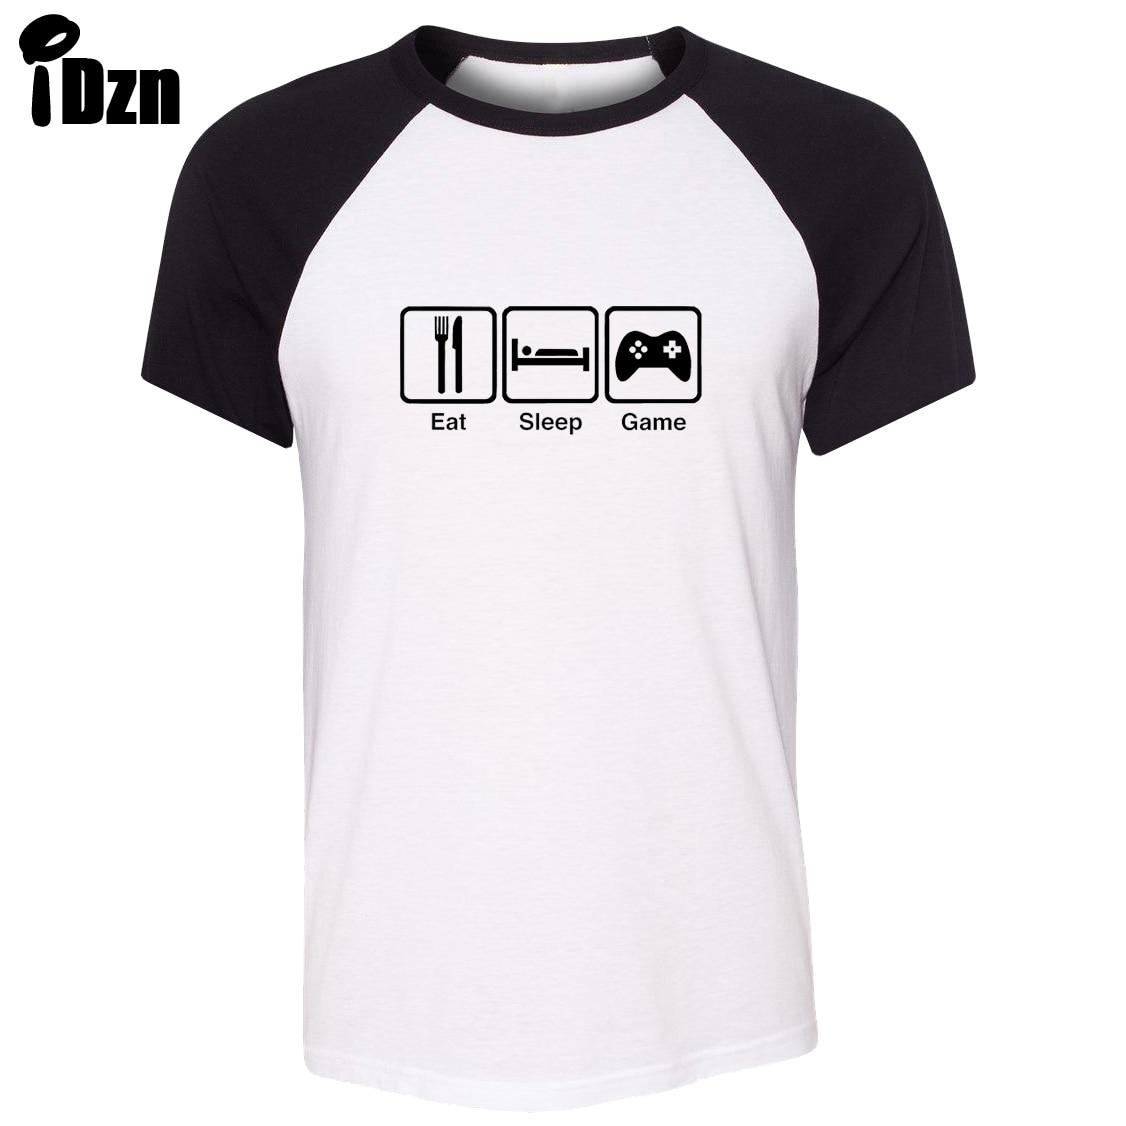 Shirt design black - Idzn Summer Men Raglan Short Sleeve T Shirt Funny Enjoy Life Eat Sleep Game Art